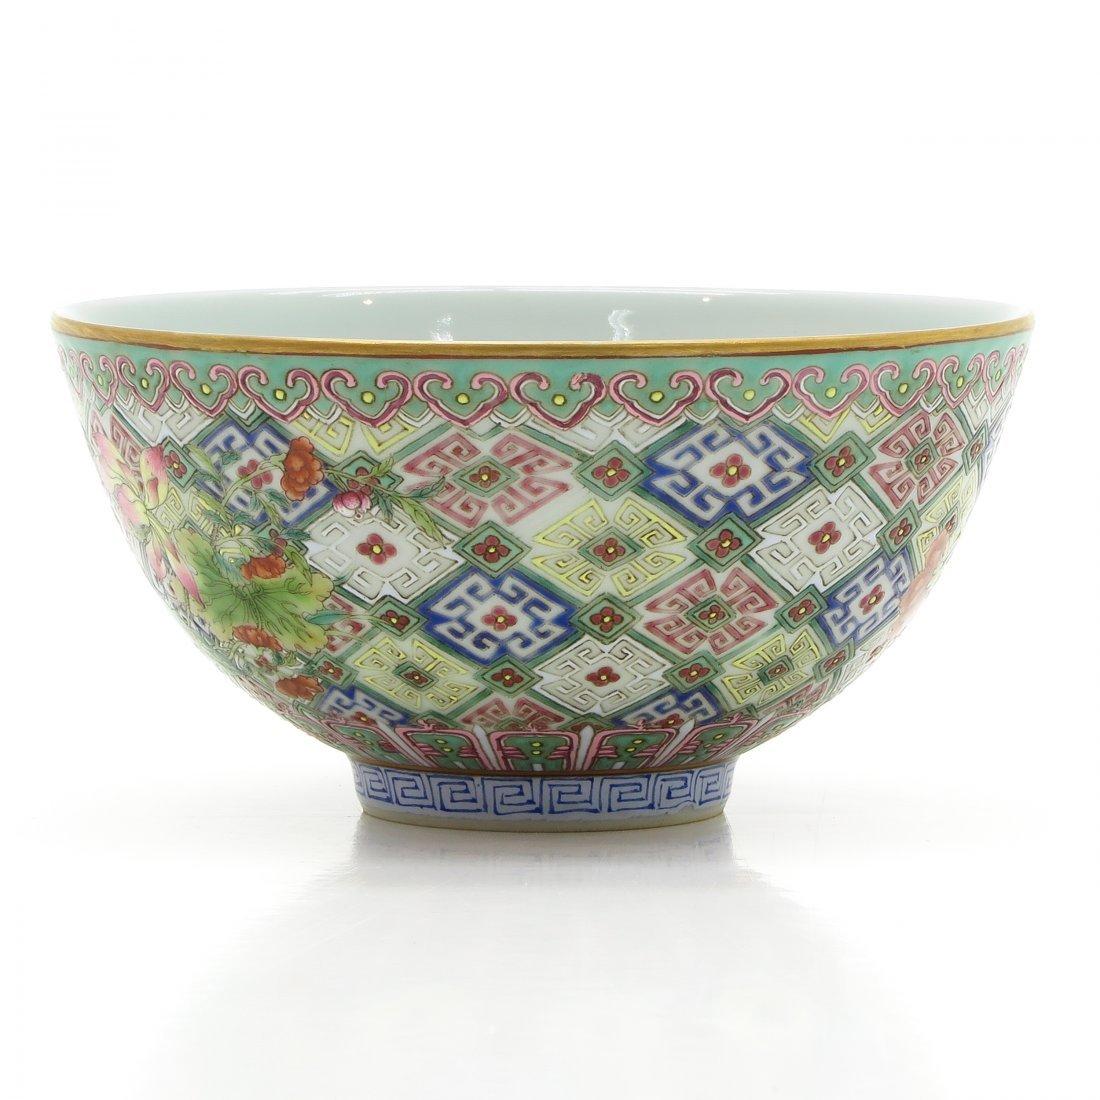 A Fine China Porcelain Daoguang Period Bowl